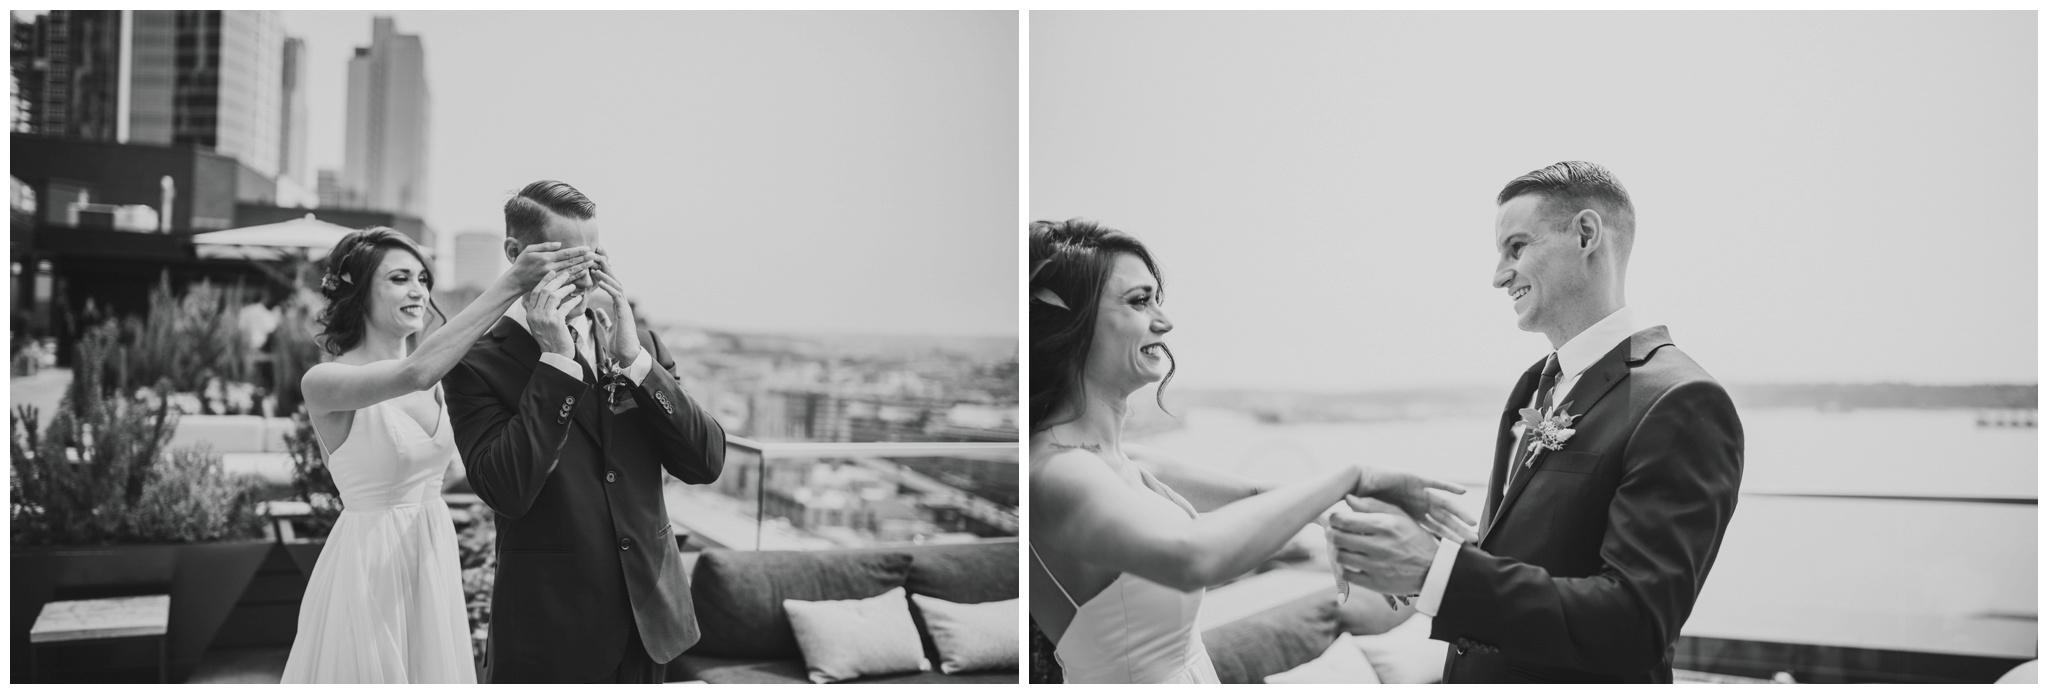 alyssa-keiran-westland-distillery-urban-seattle-wedding-photographer-caitlyn-nikula-48.jpg